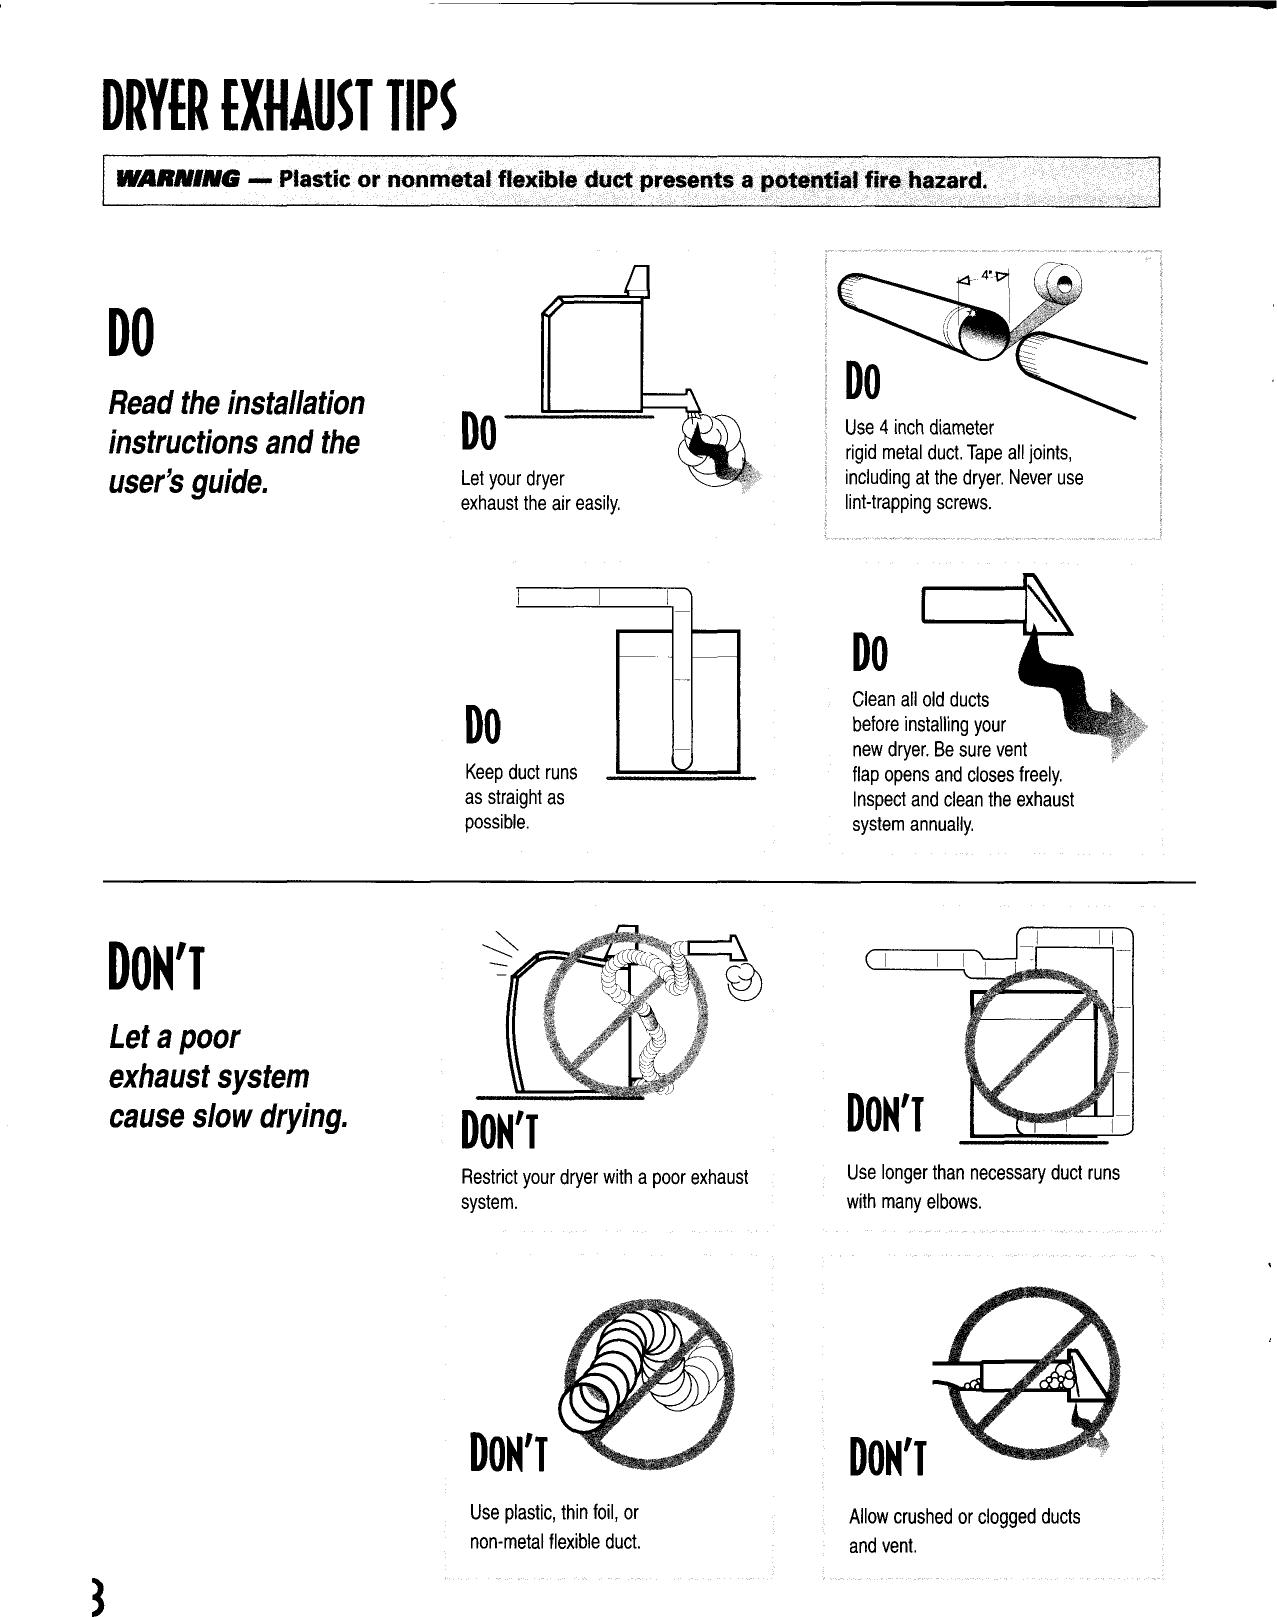 MAYTAG Residential Dryer Manual L0911307